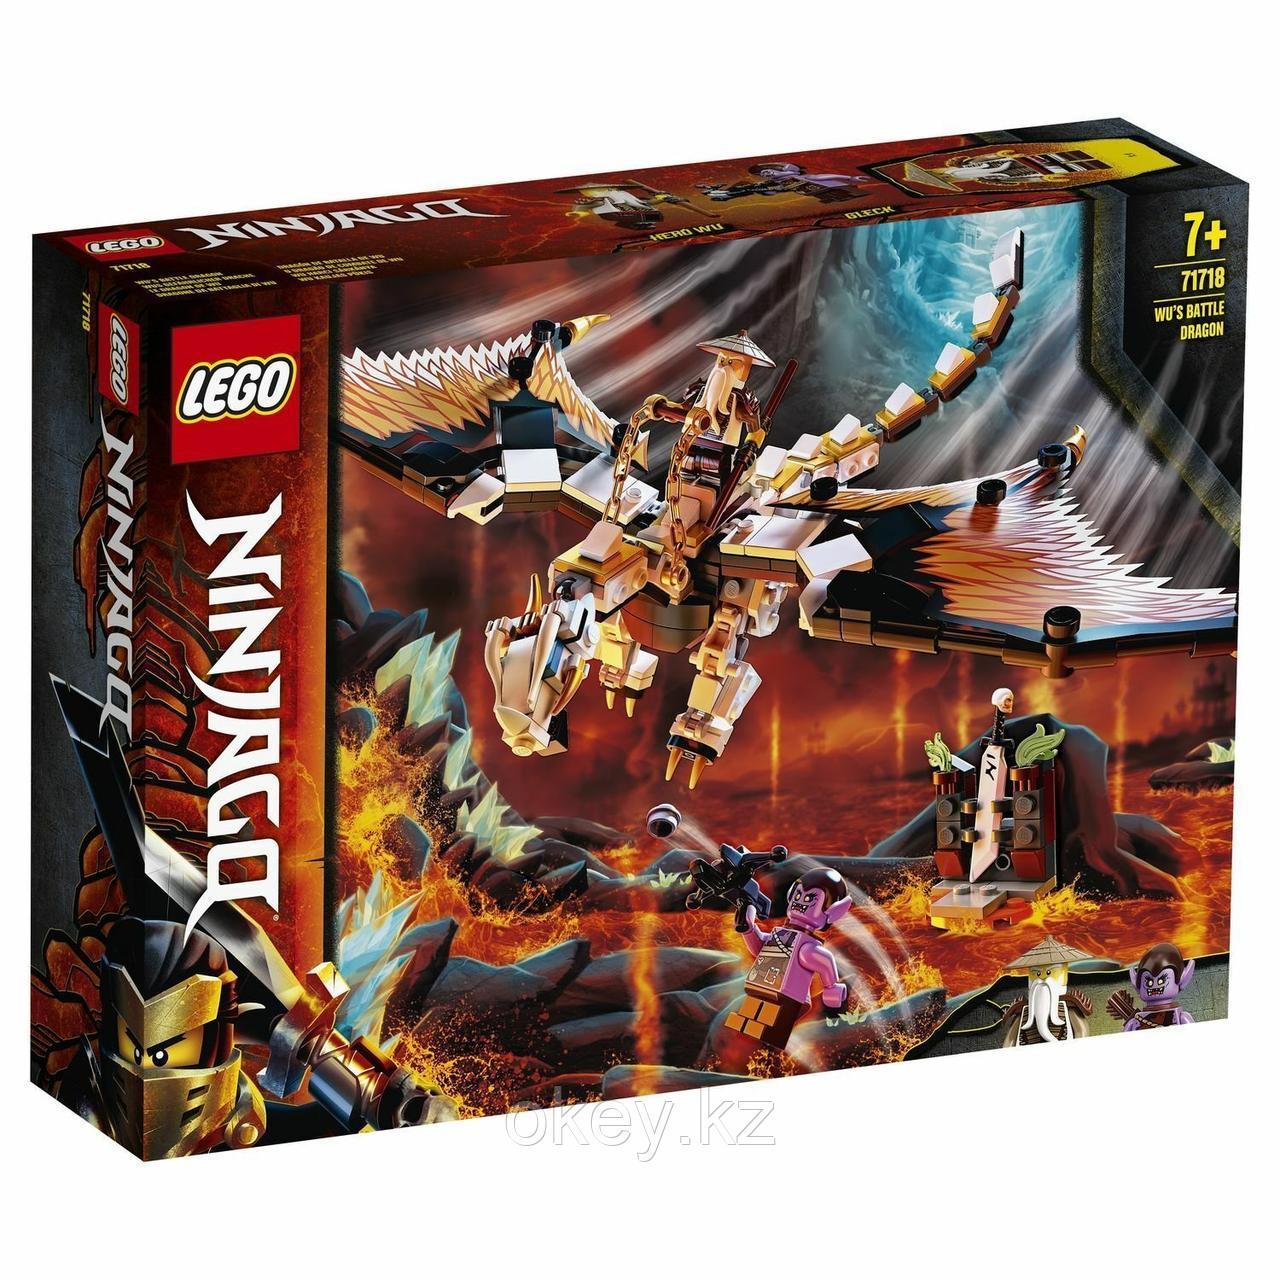 LEGO Ninjago: Боевой дракон Мастера Ву 71718